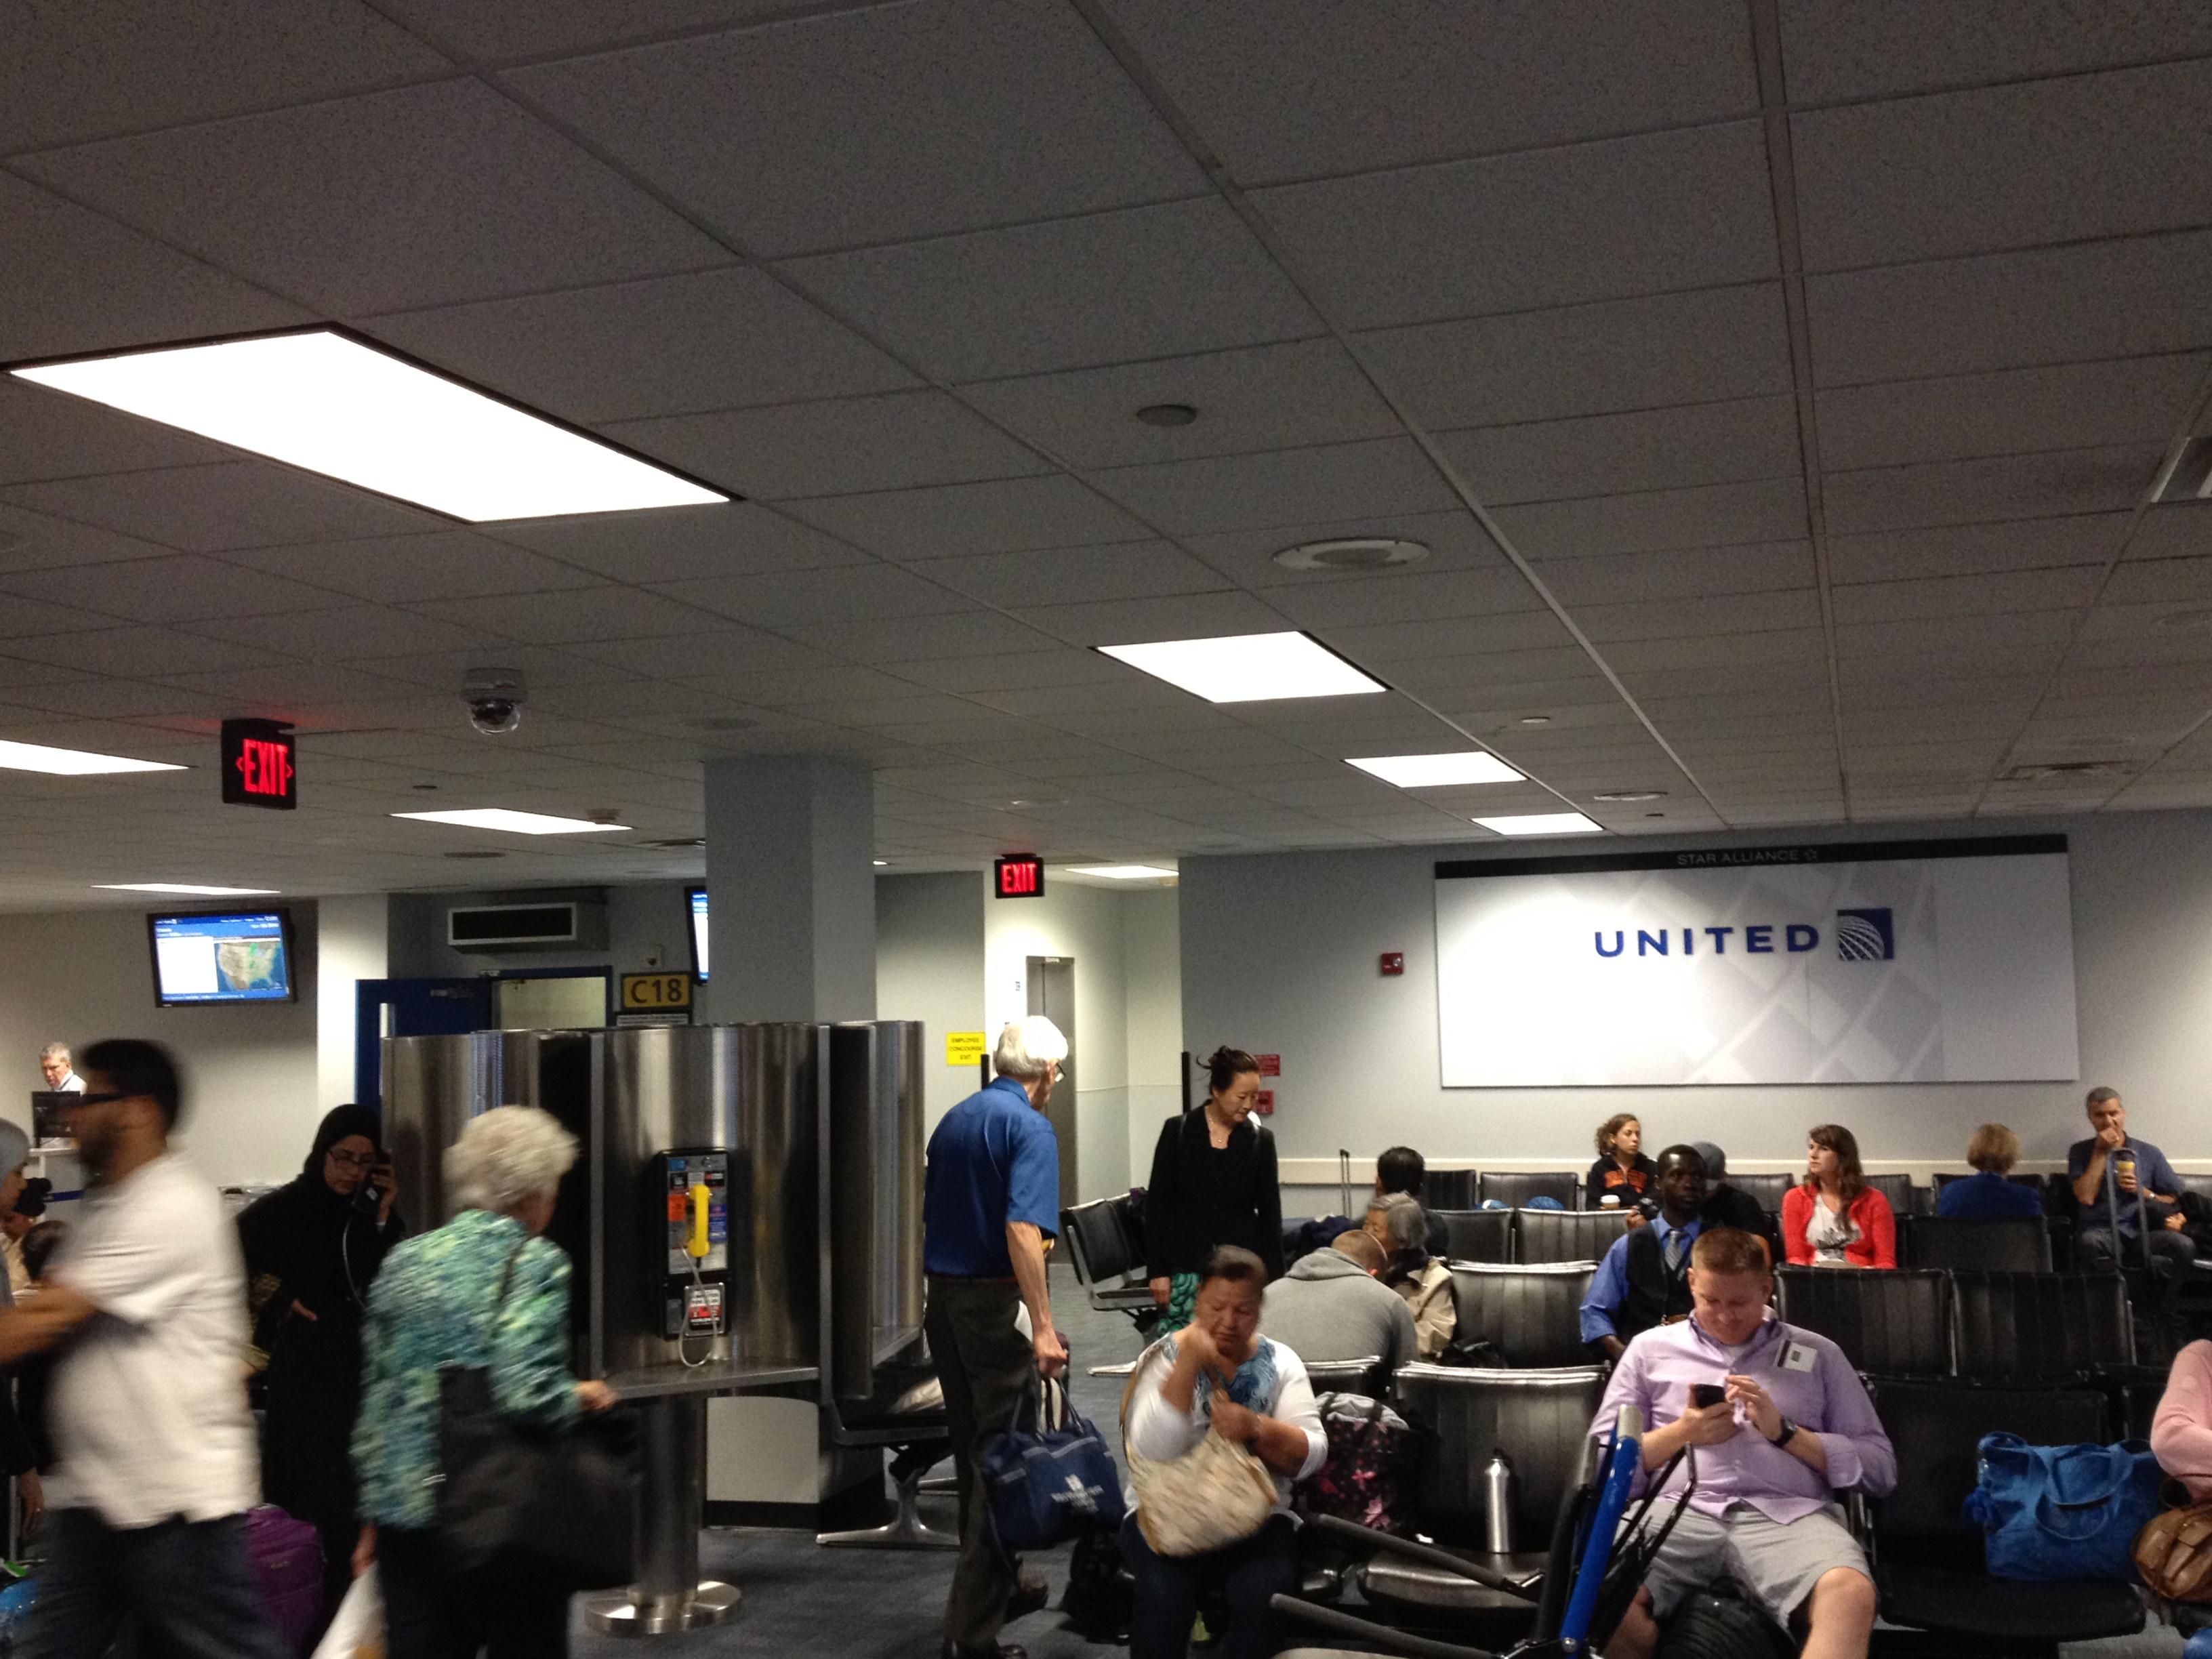 Dulles International Airport, Washington, DC